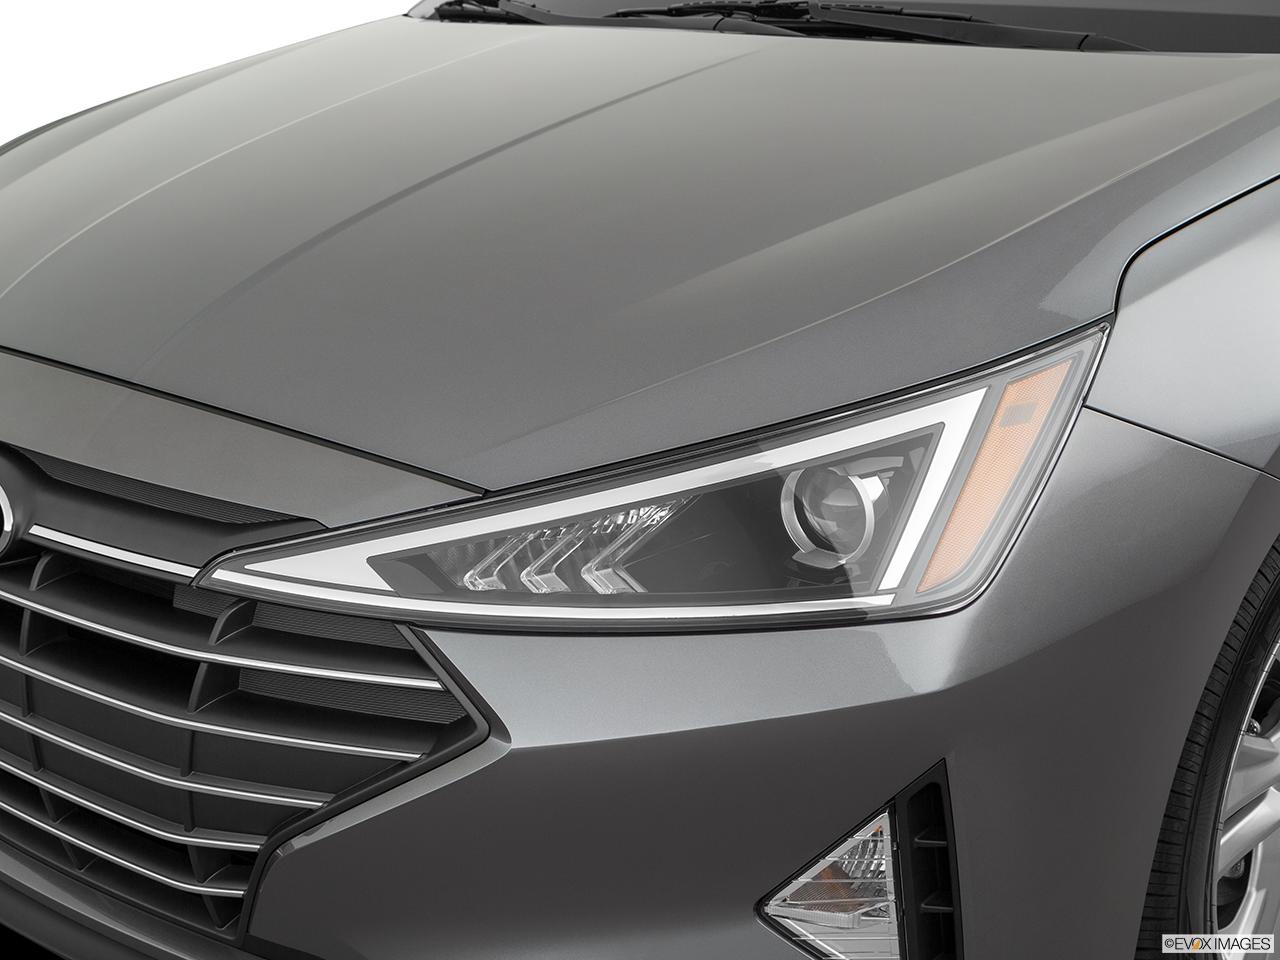 2019 Hyundai Elantra photo